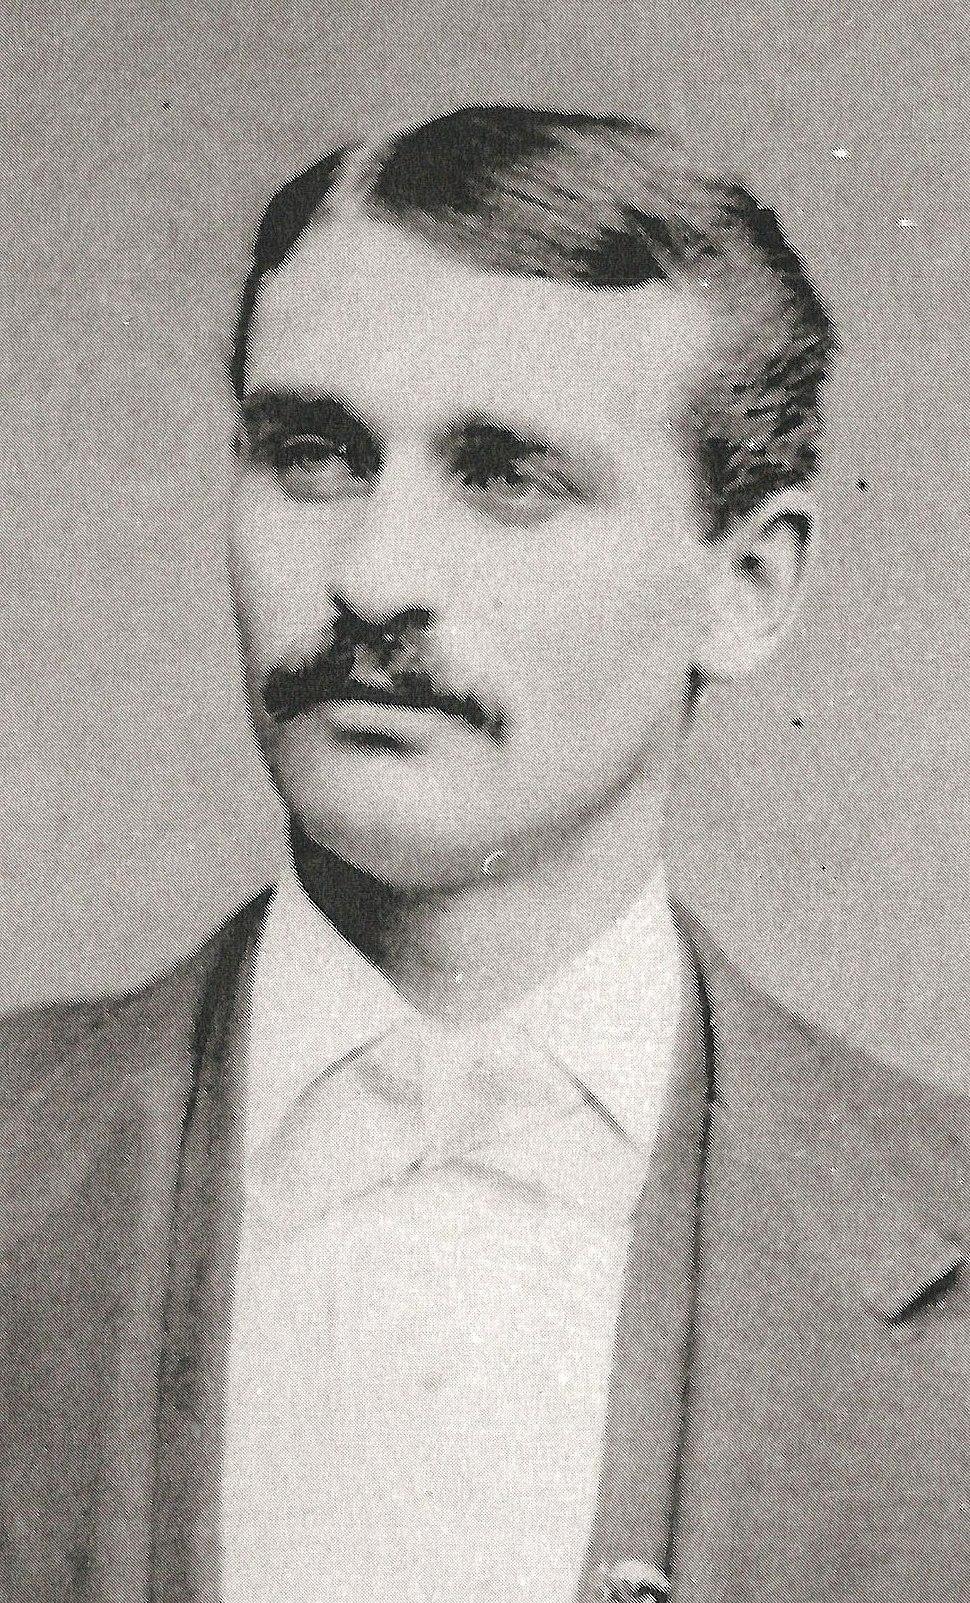 Ross Barnes 1872